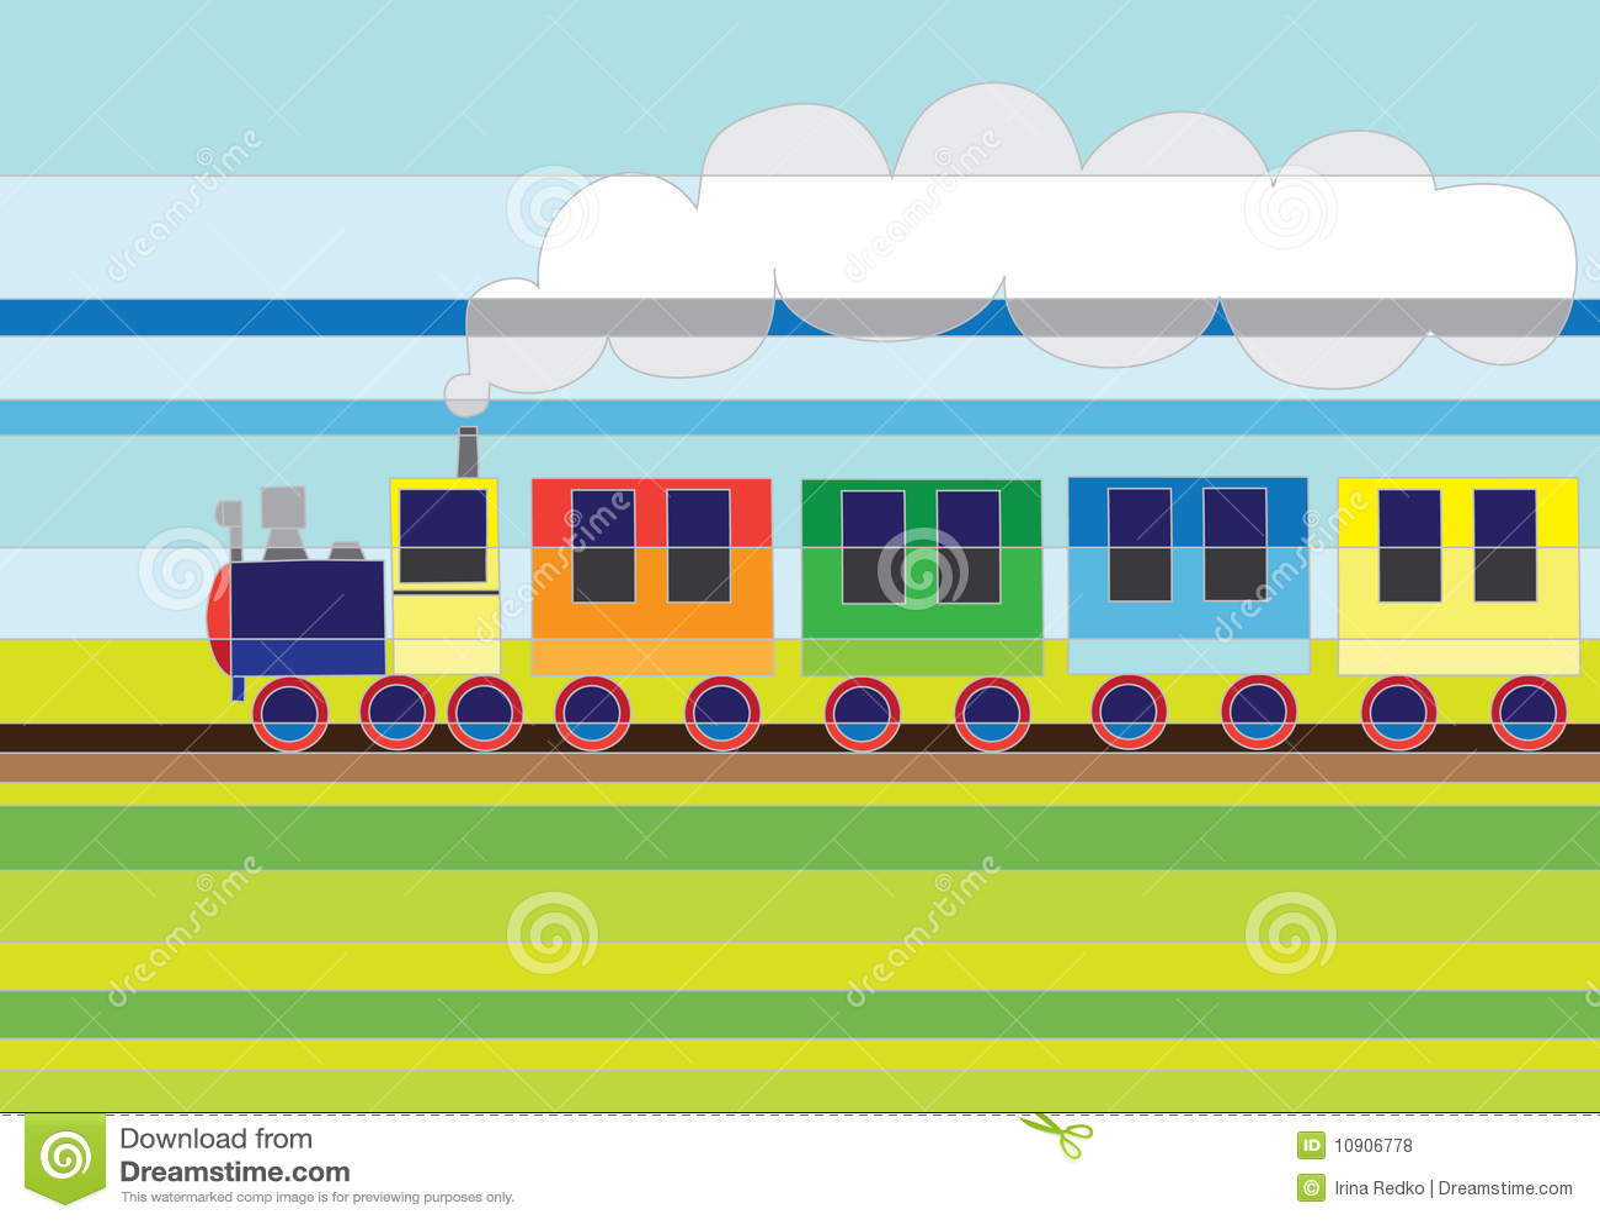 cartoon train royalty free stock photos image 10906778